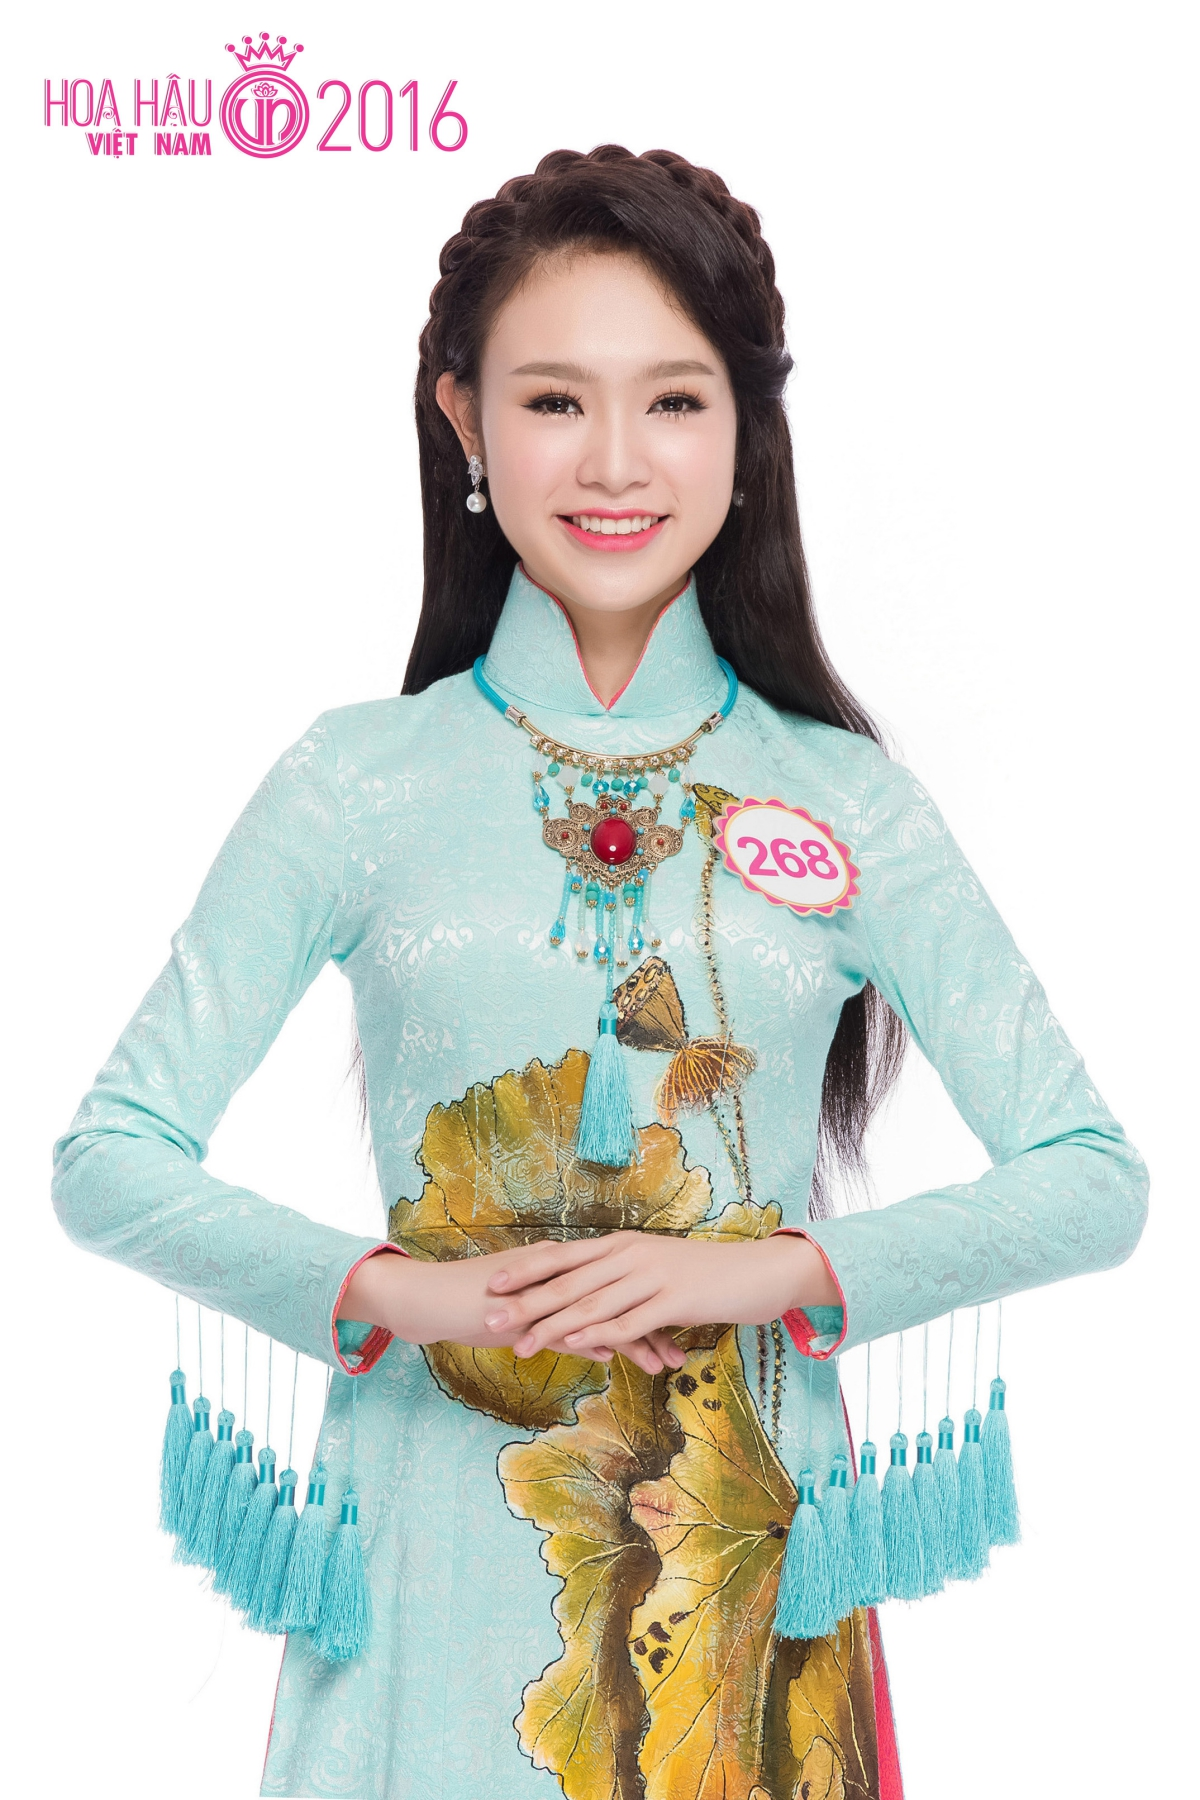 6 - Phung Bao Ngoc Van 1